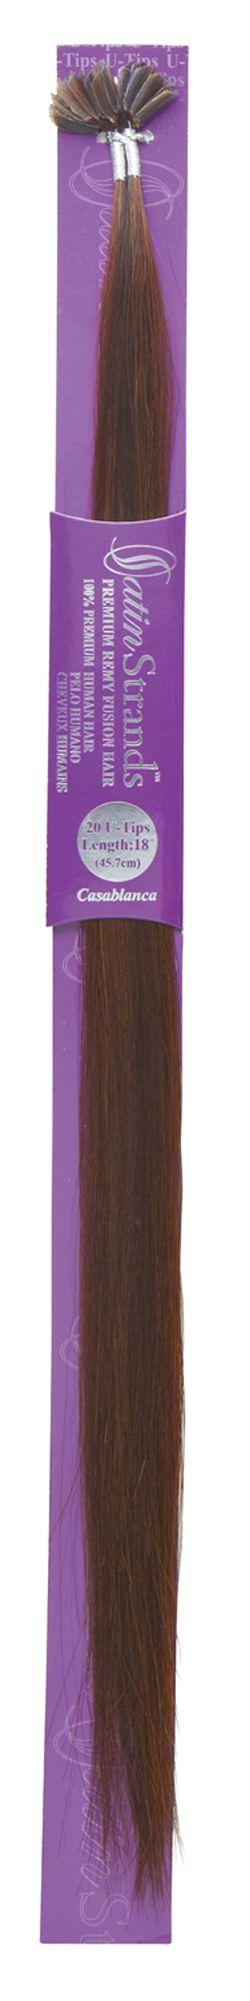 Satin Strands I Tip Hair Extensions Reviews 116